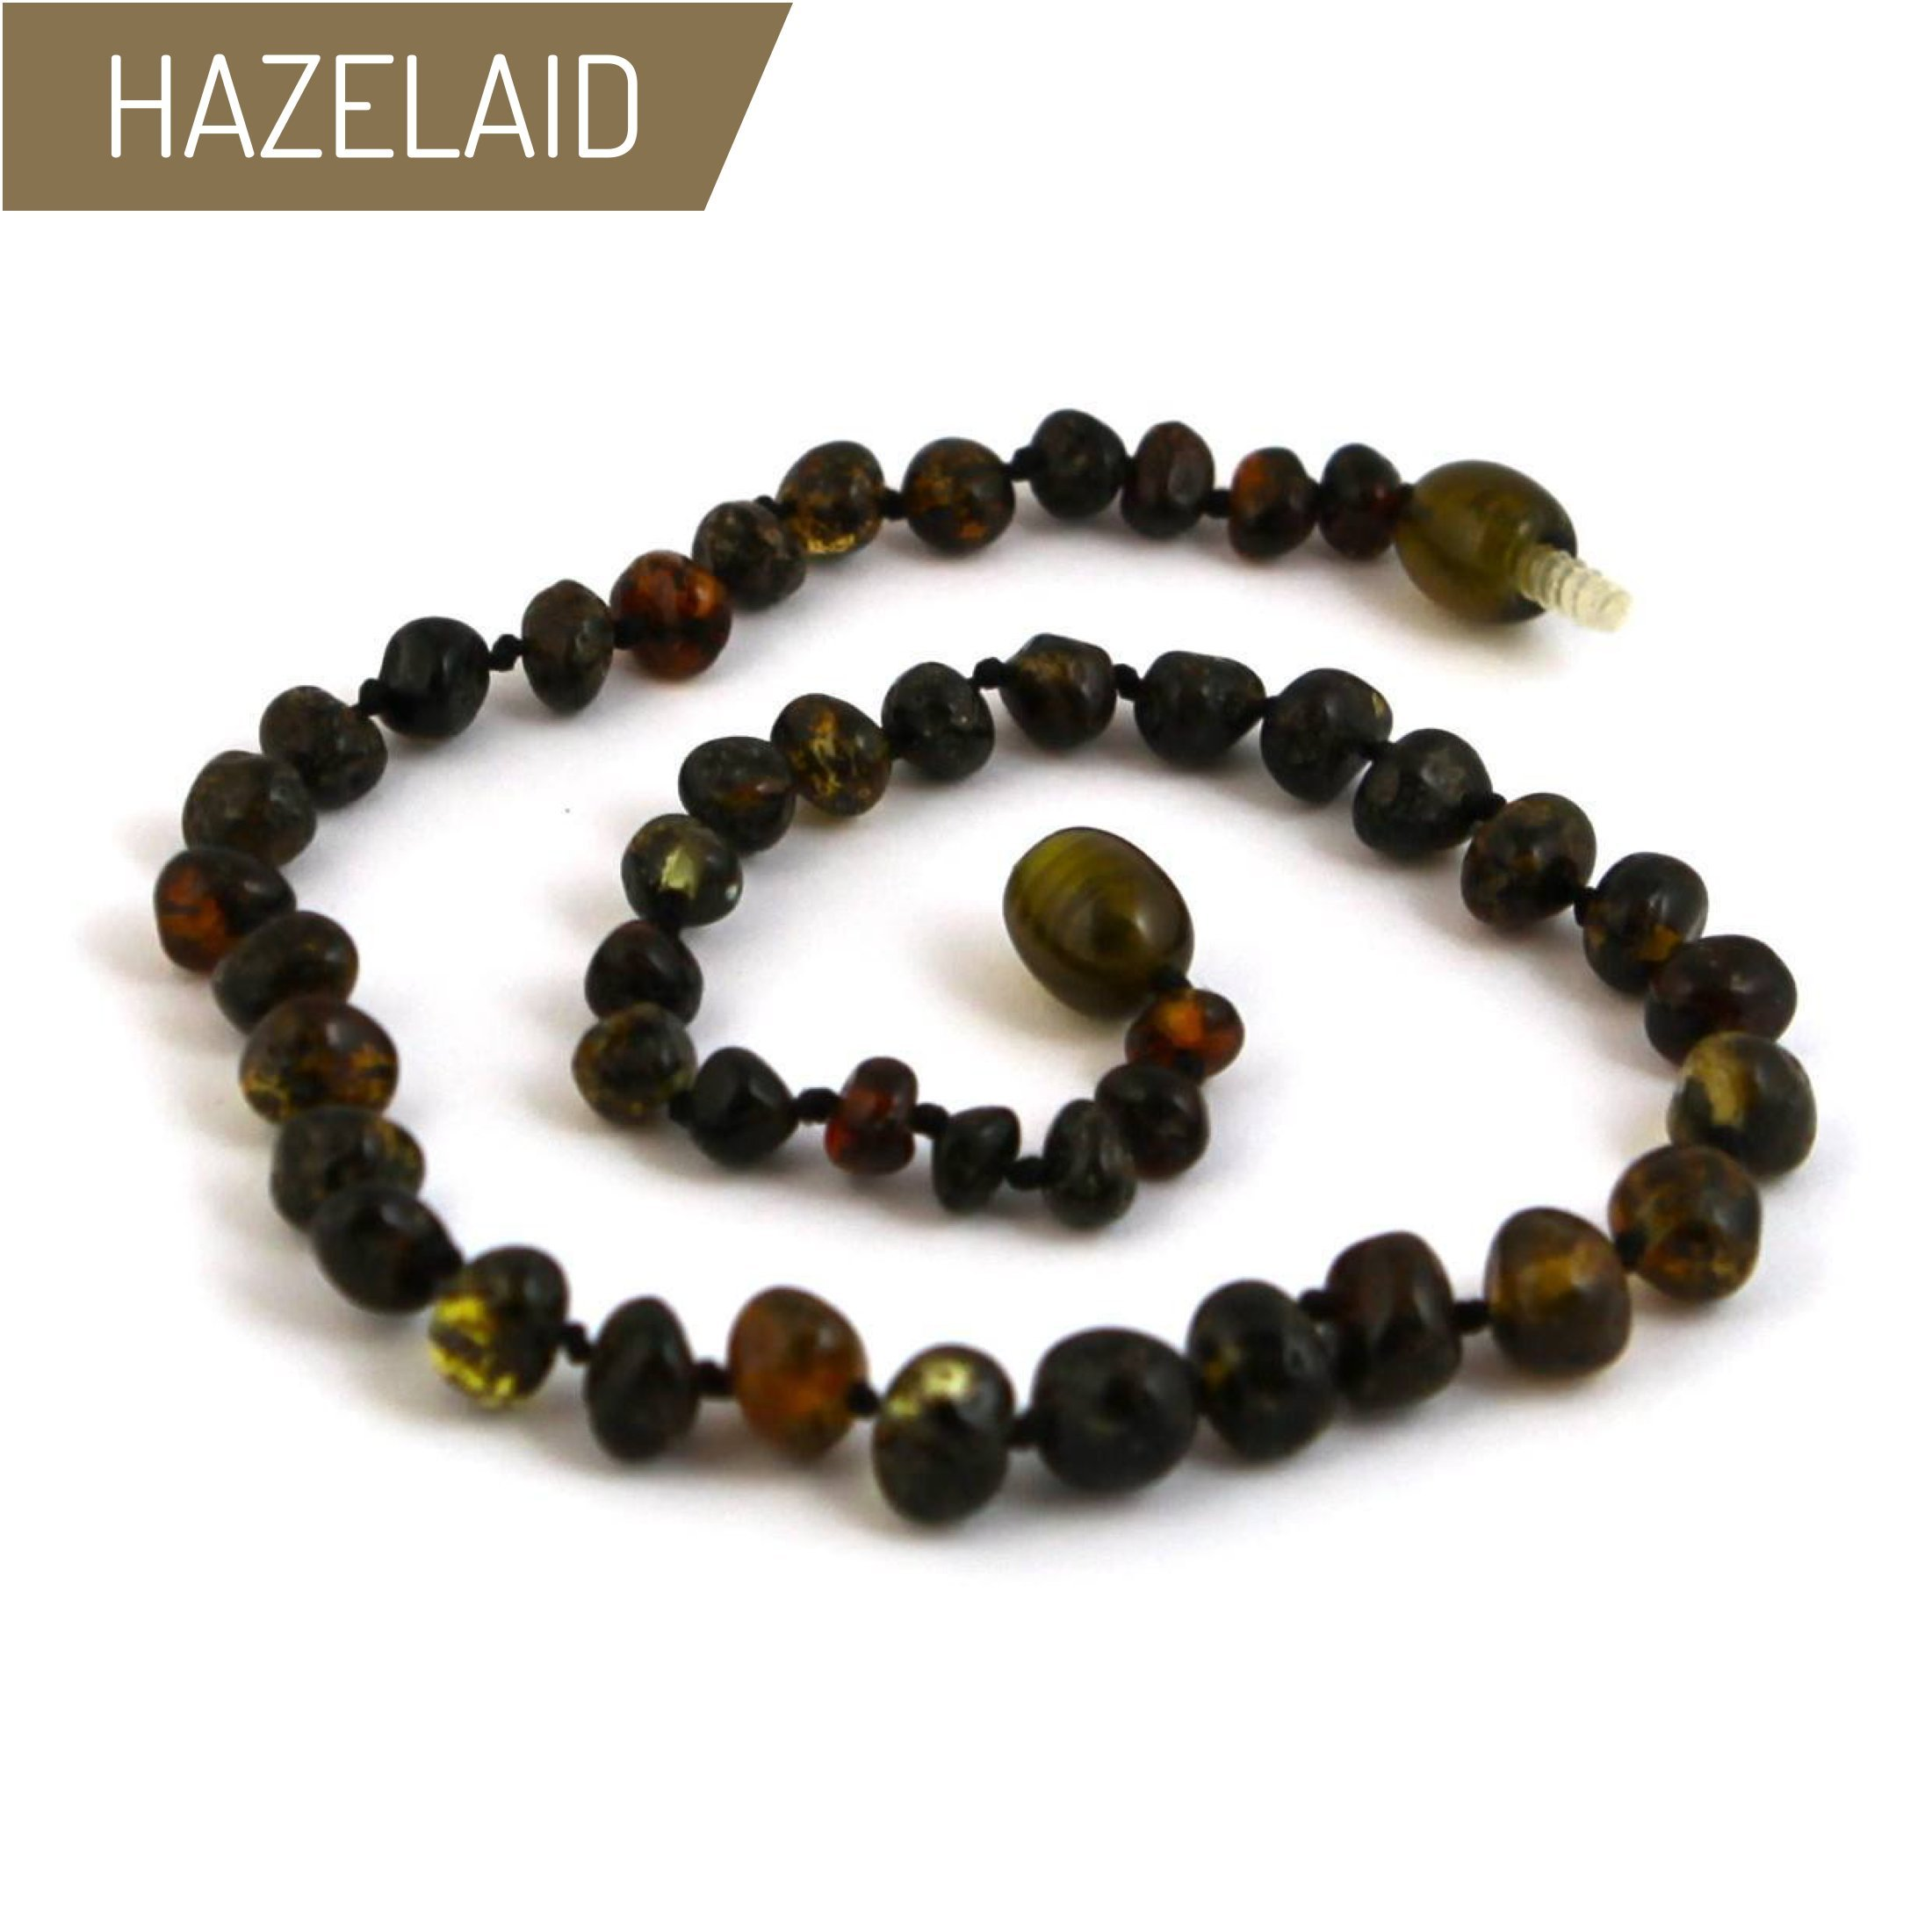 Hazelaid (TM) 14'' Twist-Clasp Baltic Amber Dark Green Necklace